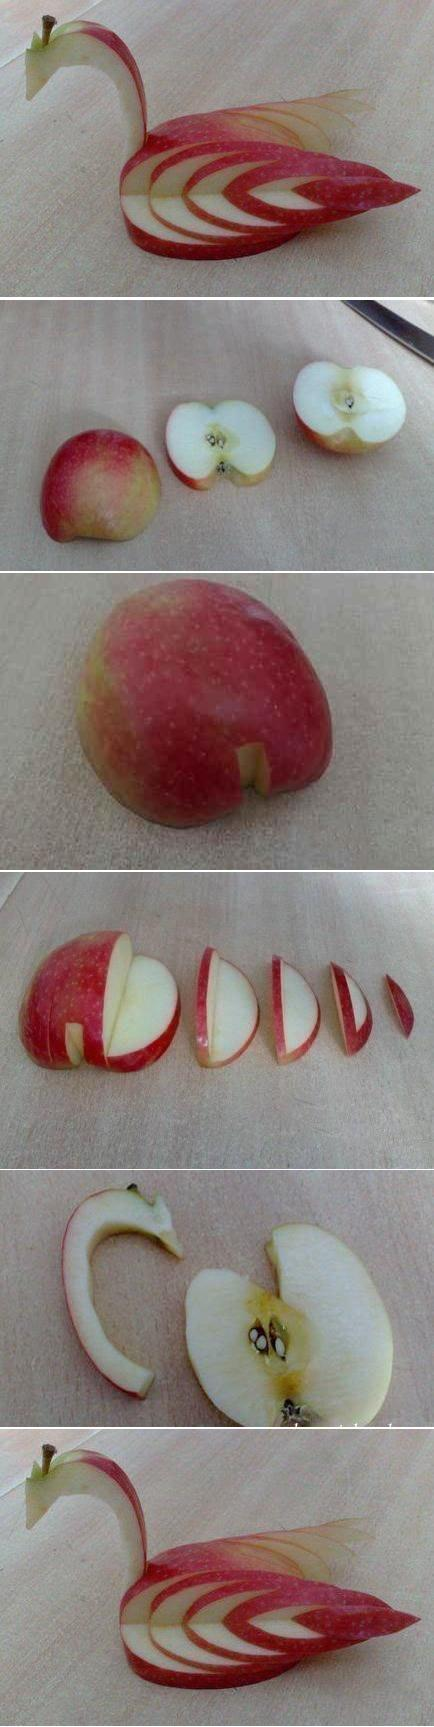 Apple-Swan